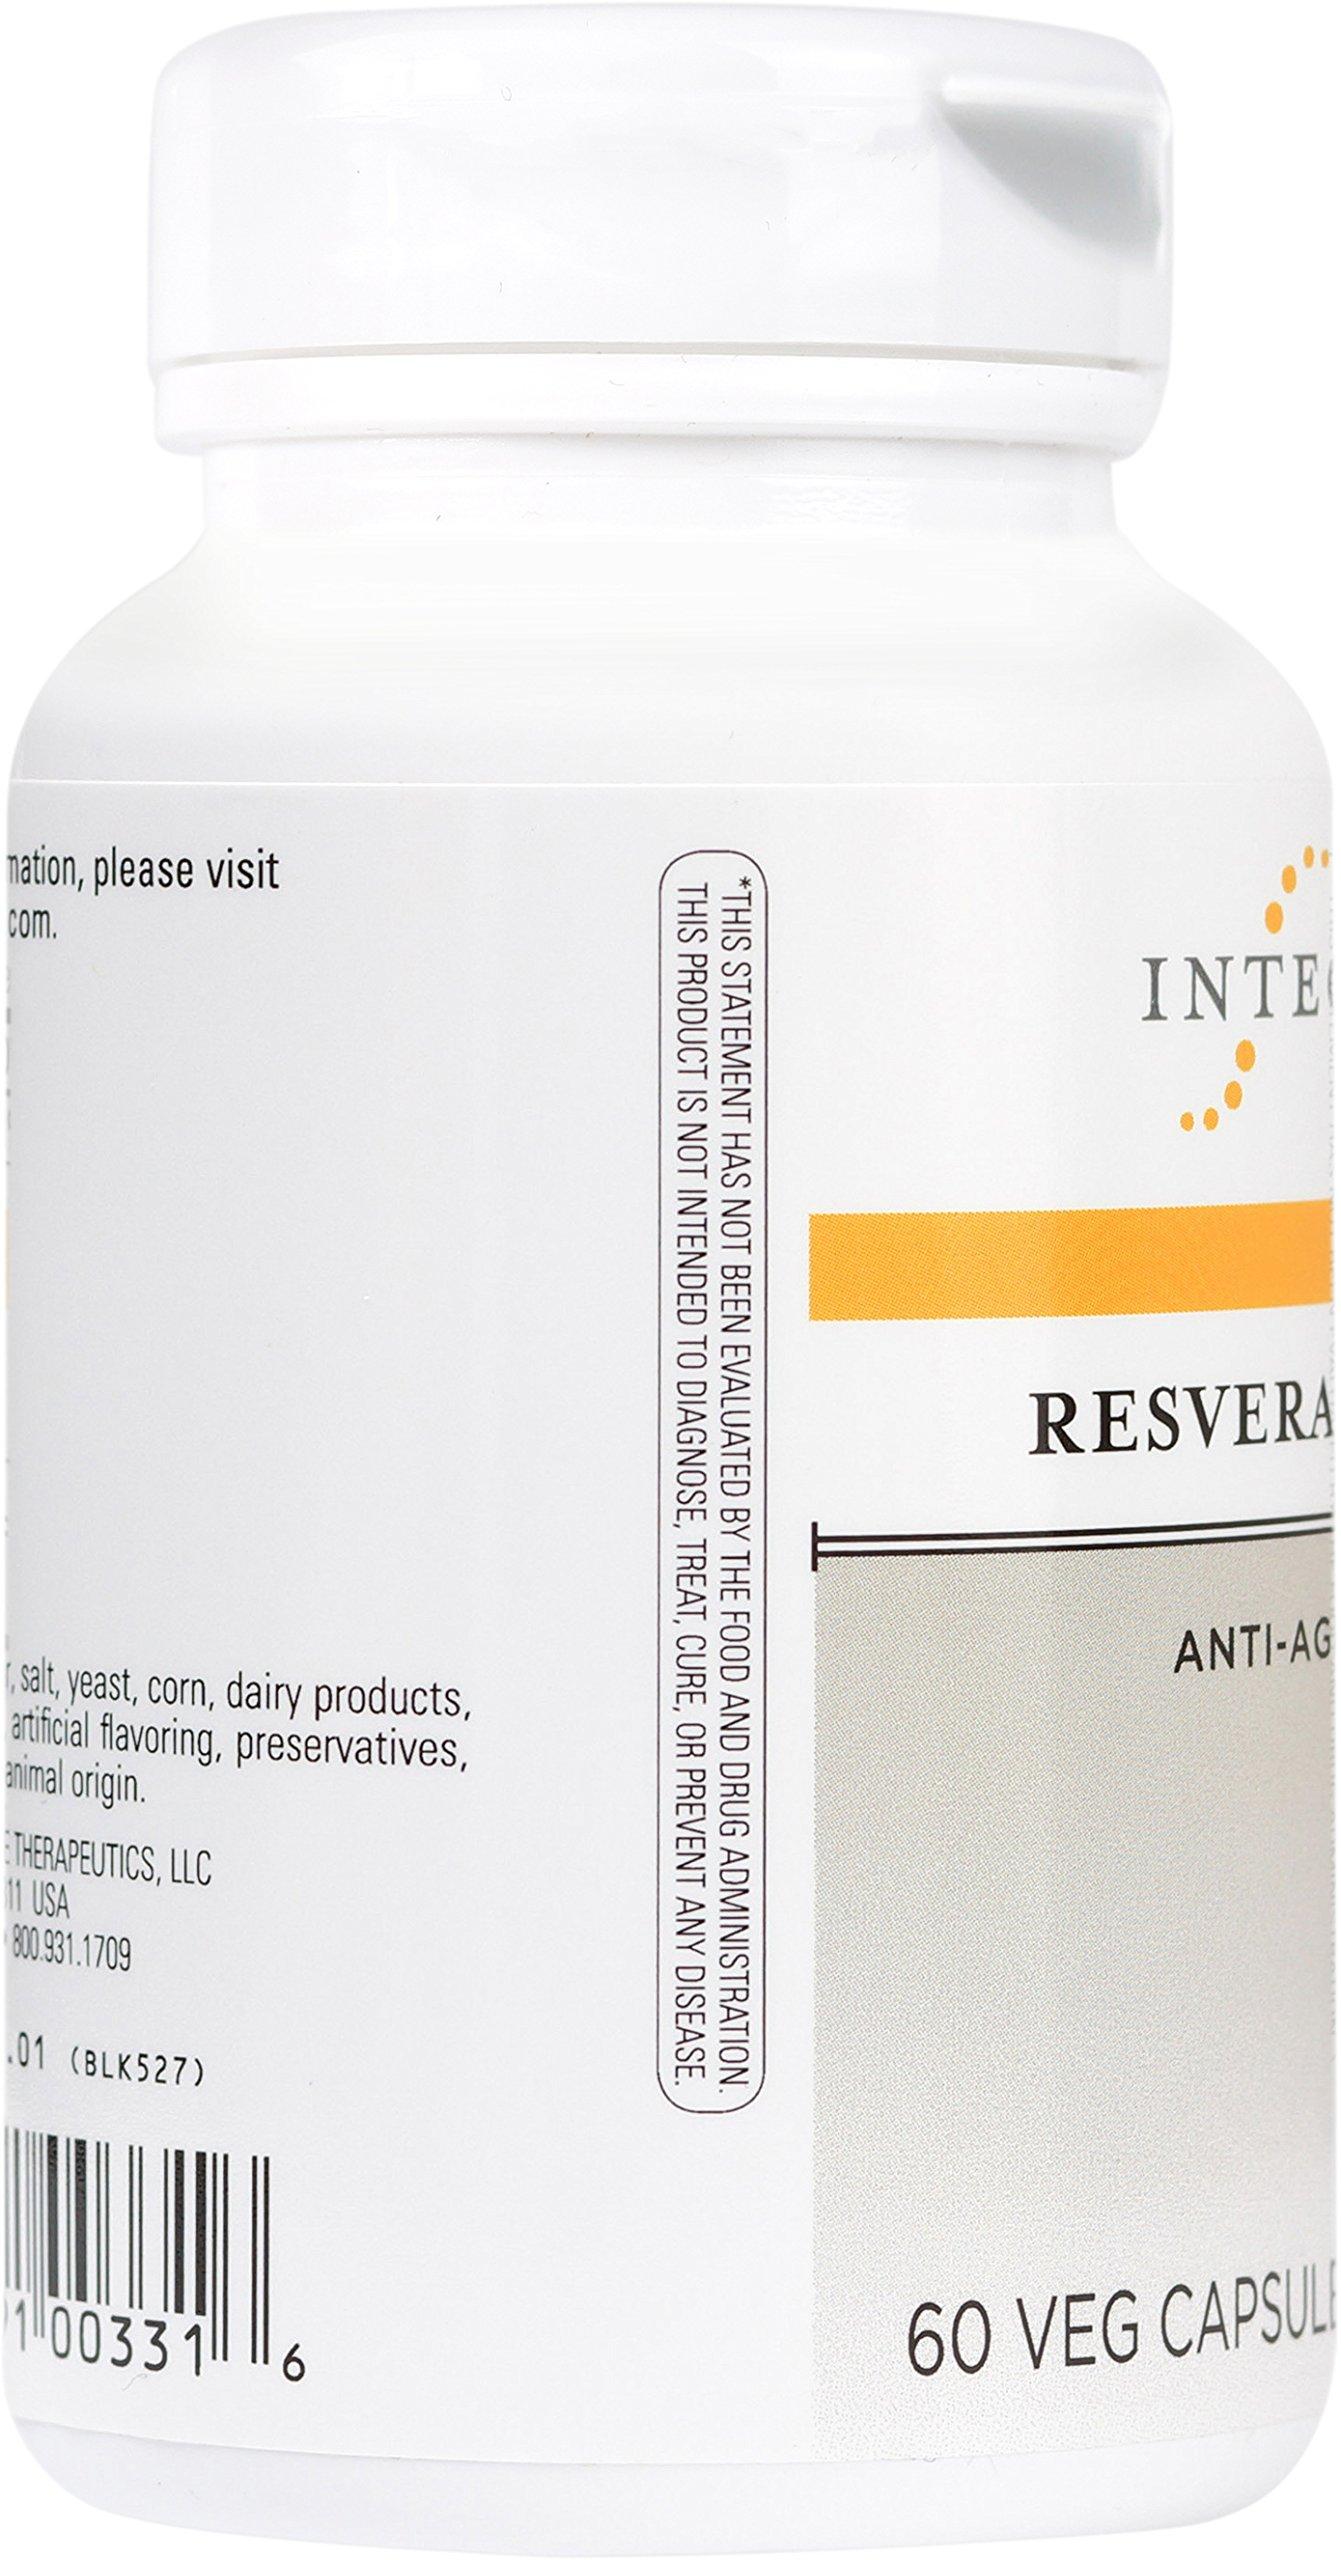 Integrative Therapeutics - Resveratrol Ultra - Anti Aging Formula - Spports Cellular Health to Reduce Oxidative Stress - 60 Capsules by Integrative Therapeutics (Image #4)